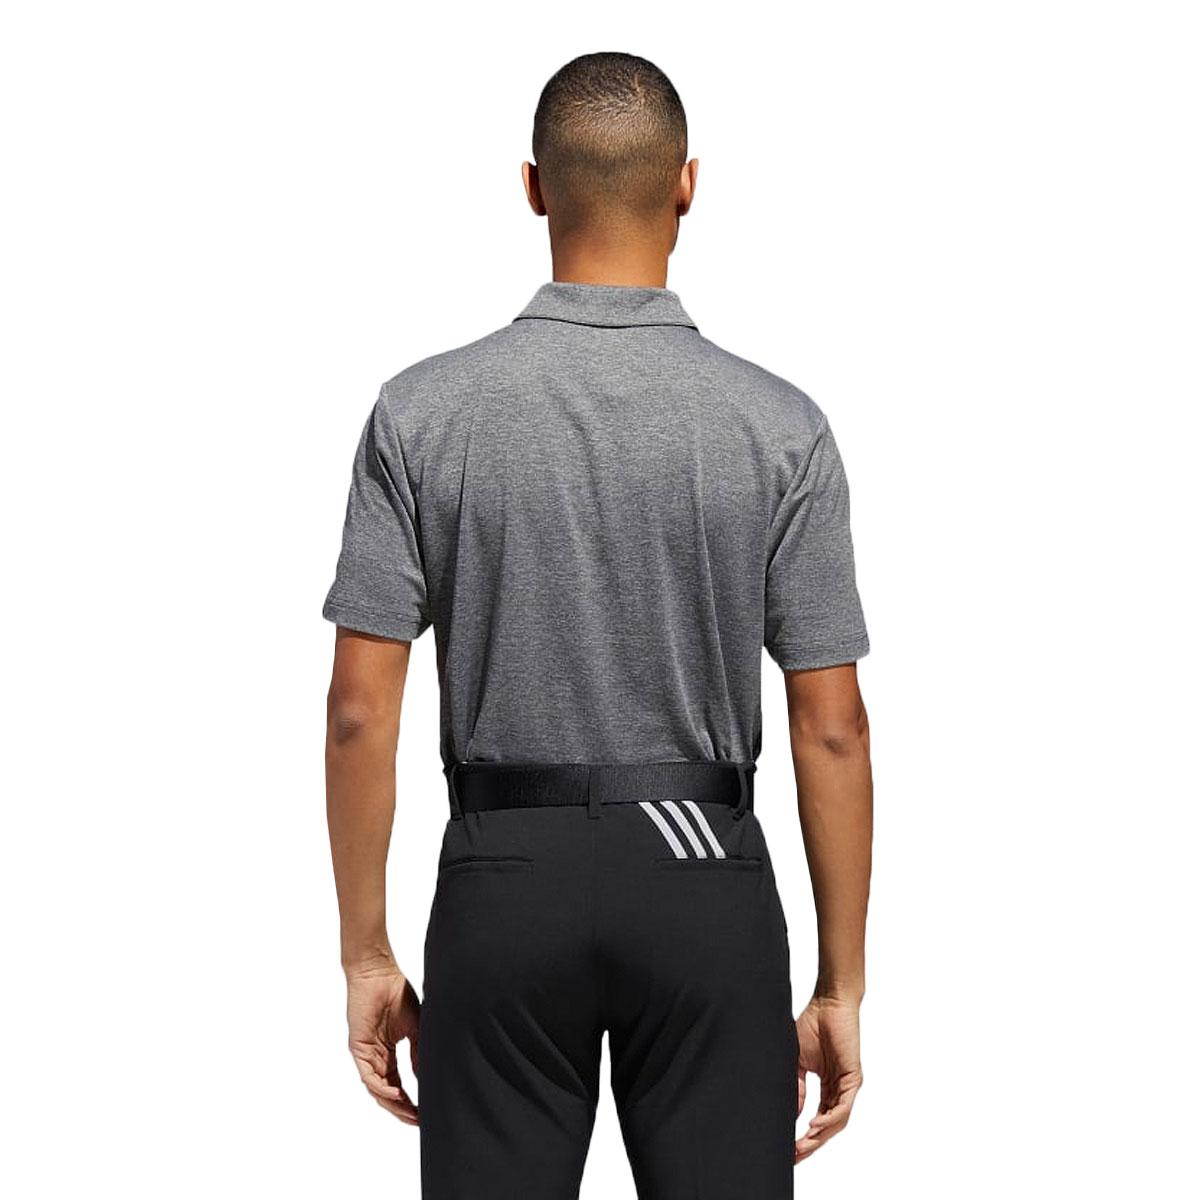 Adidas-Golf-Homme-3-Stripe-Heather-bloque-UPF-50-Polo-Shirt-43-off-RRP miniature 3